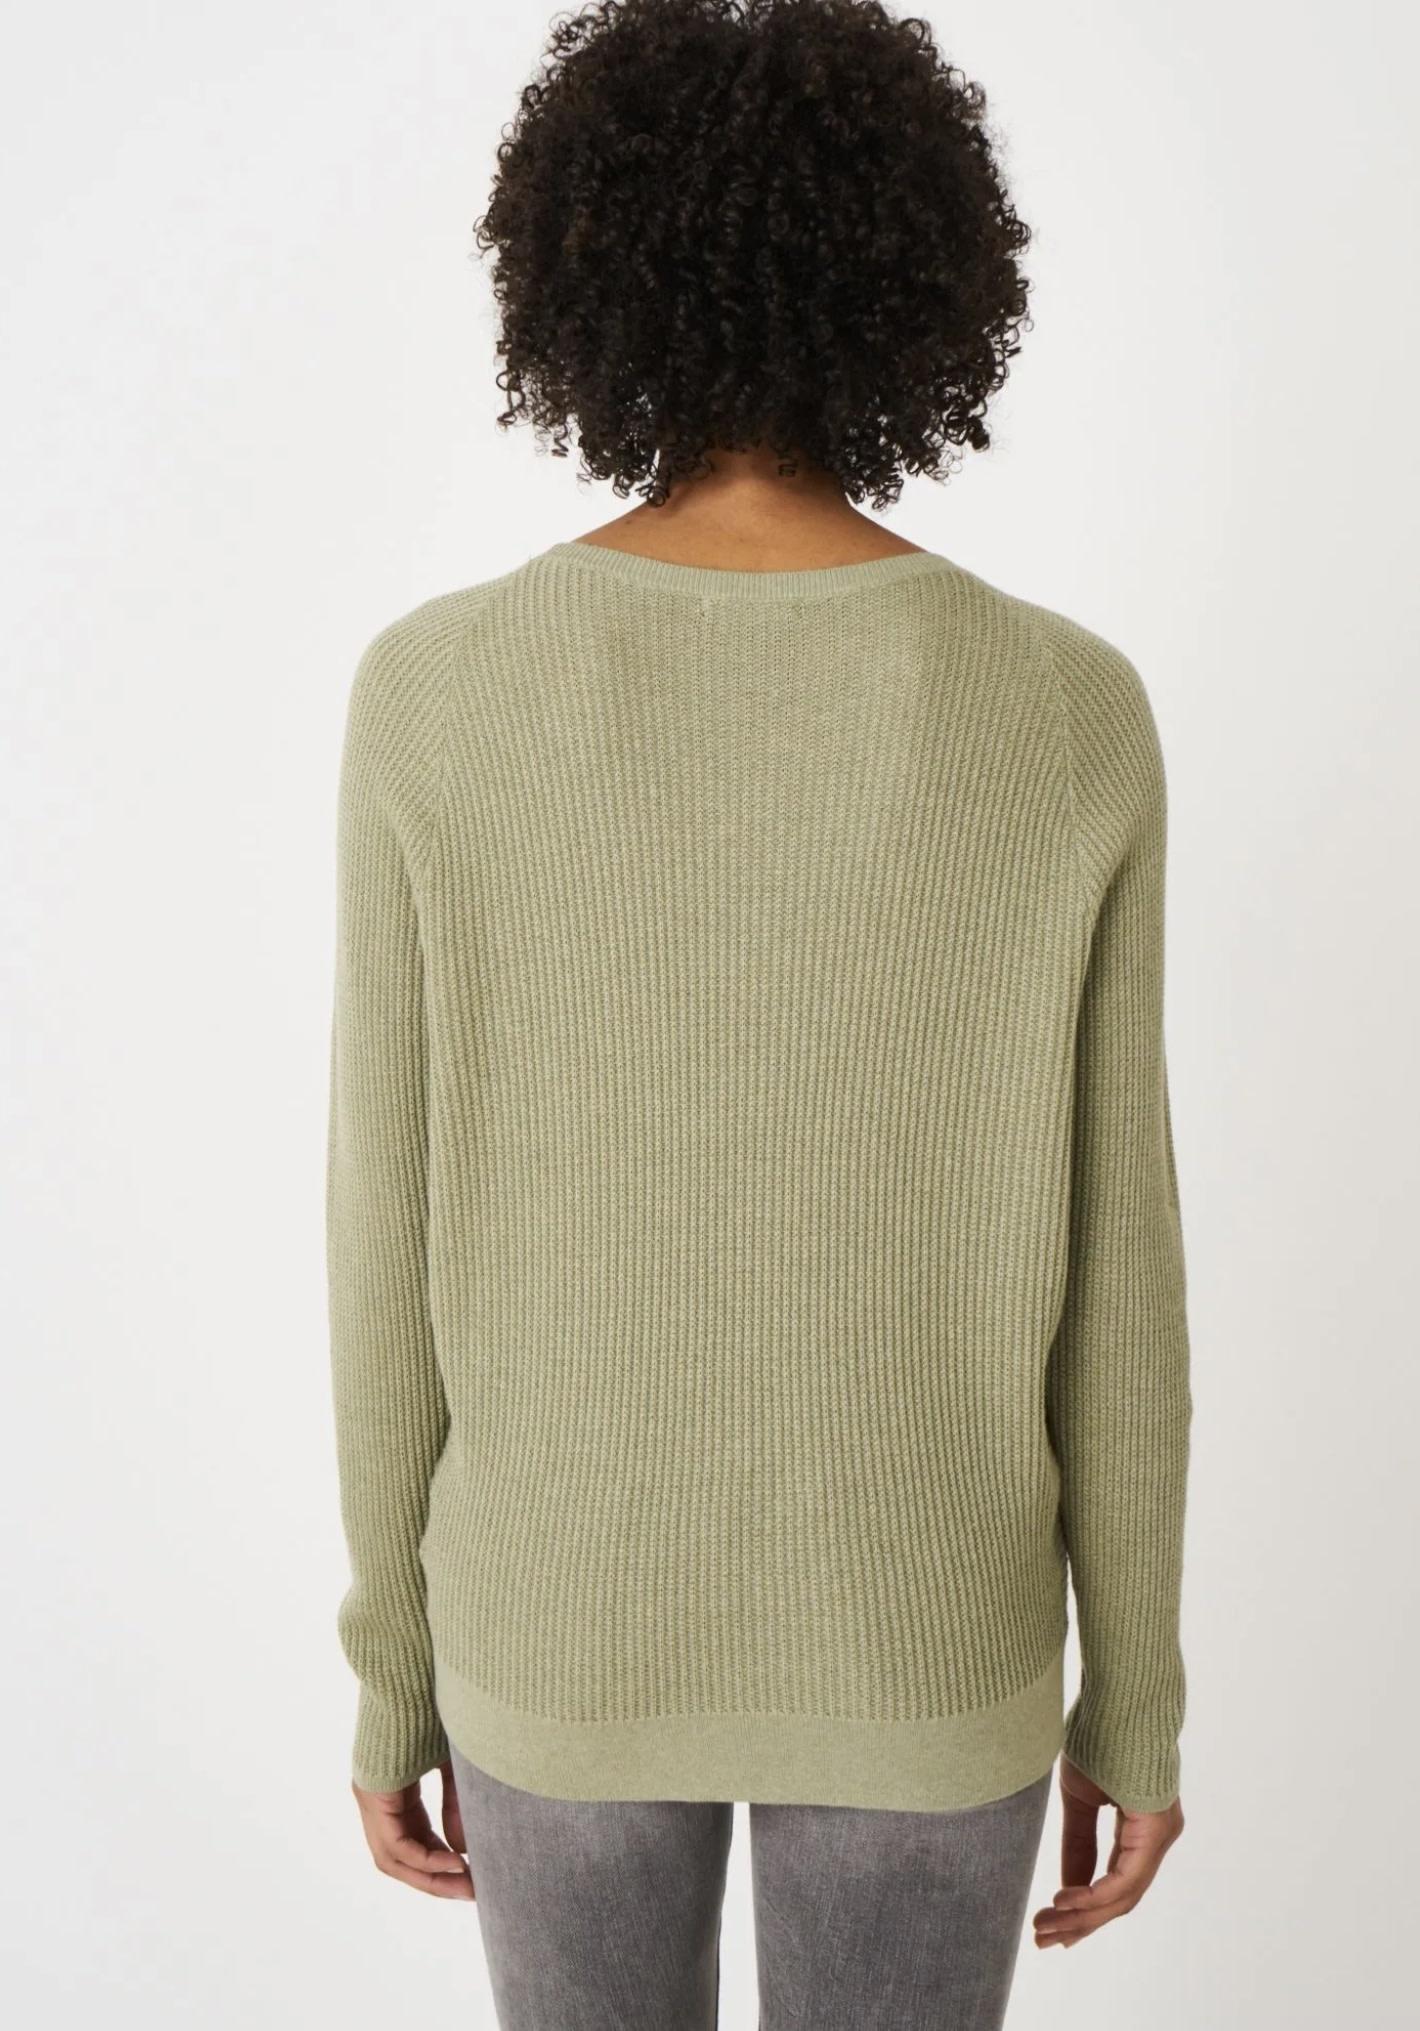 Sweater Repeat 400450-2